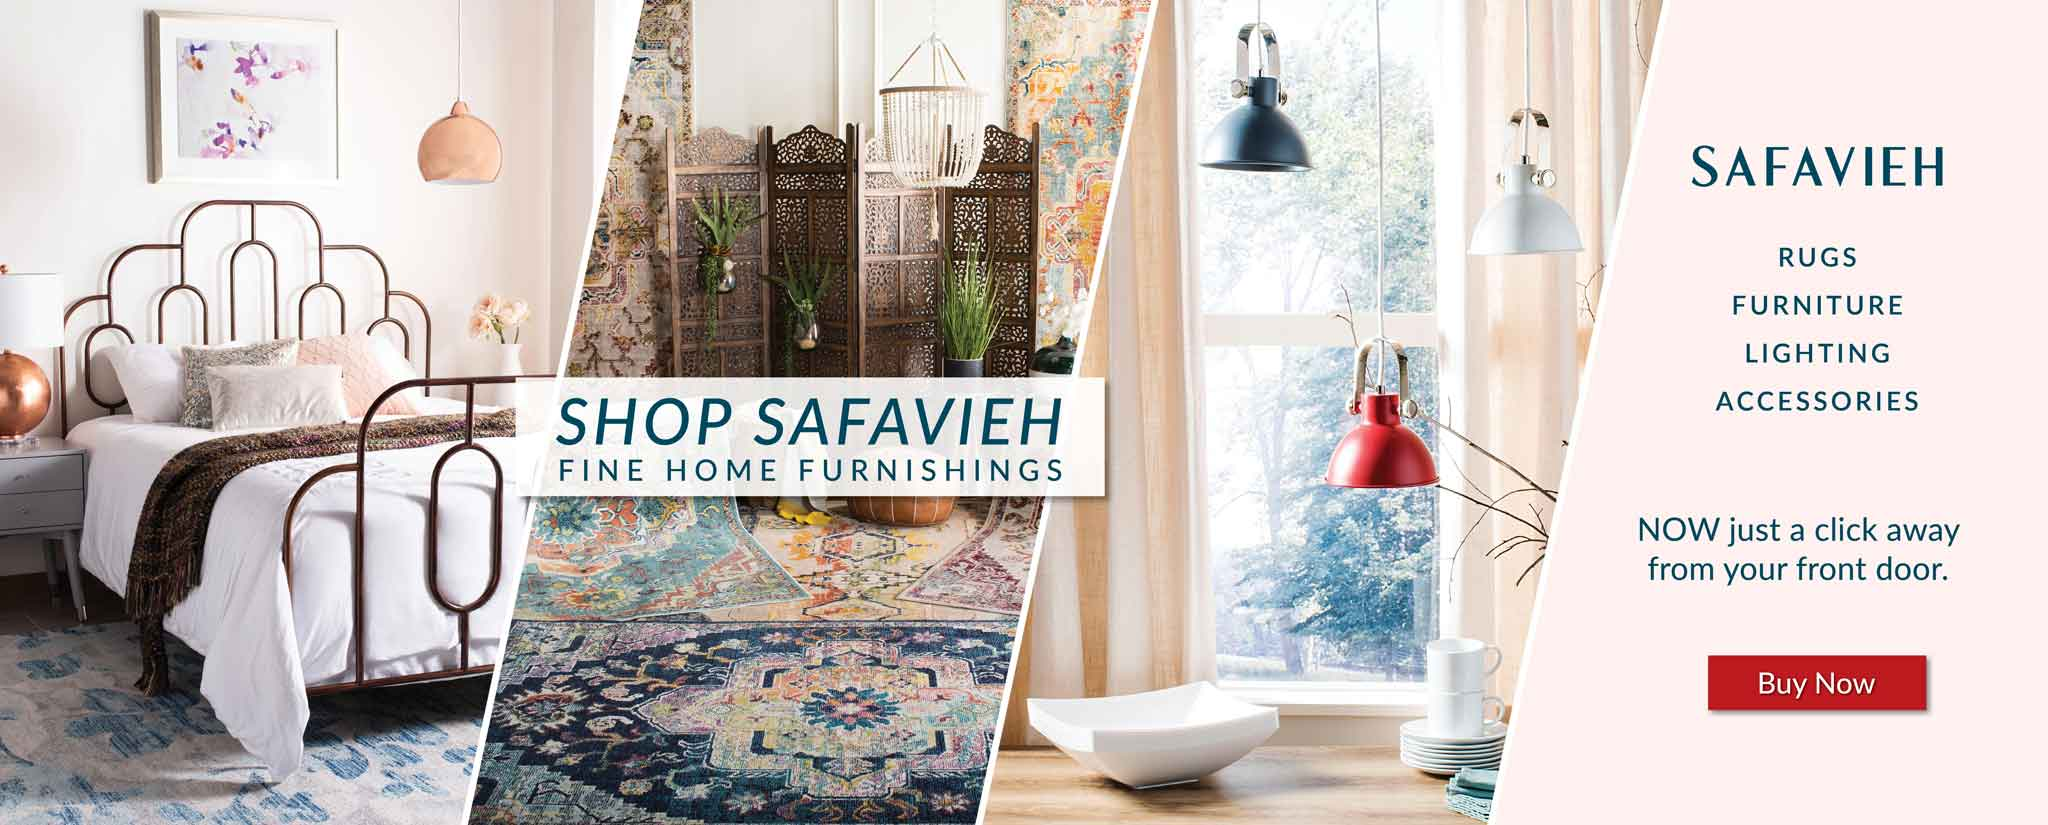 Shop Safavieh